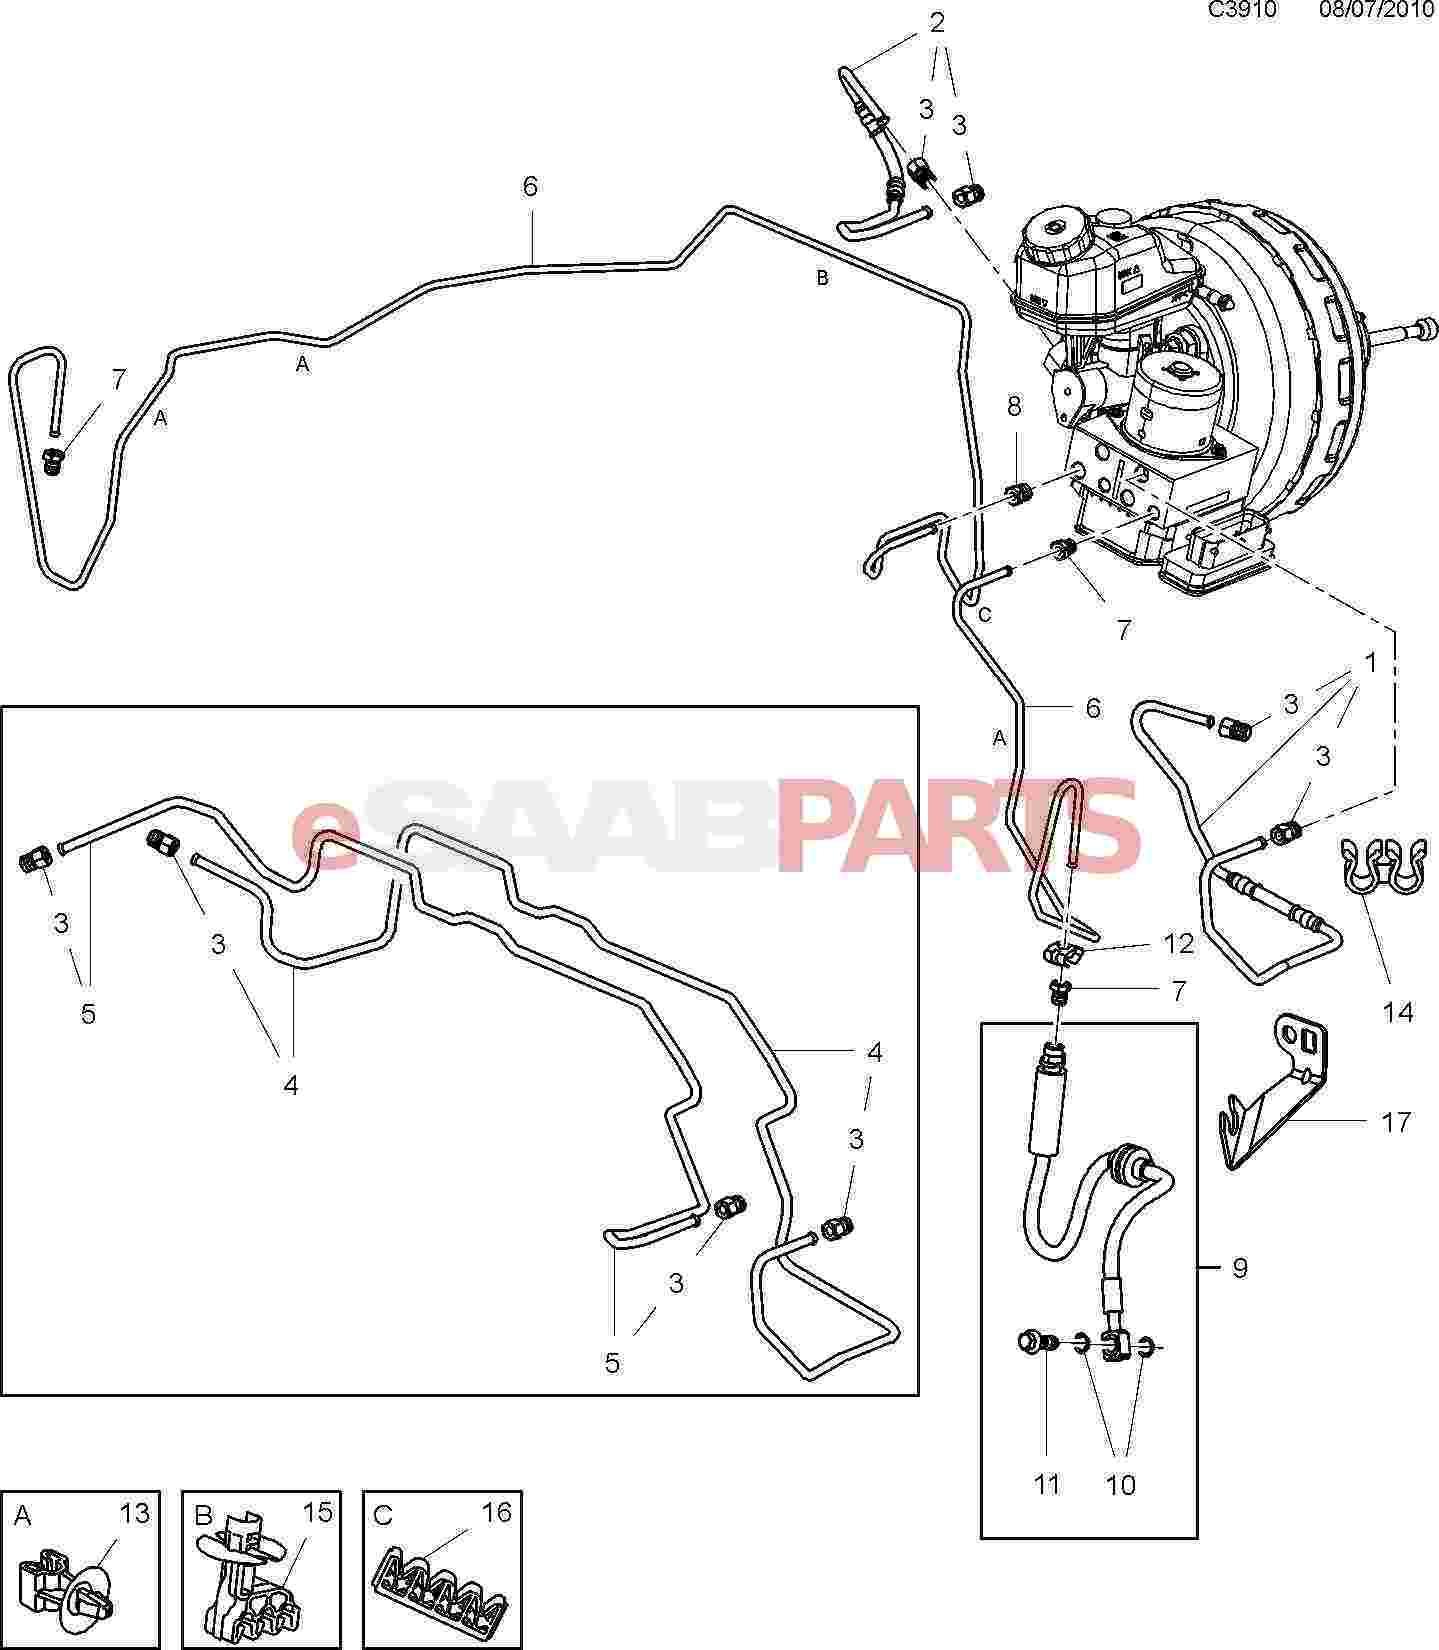 2006 saab 9 3 wiring diagram glock exploded view designs 5 rear caliper oliviadanielle co